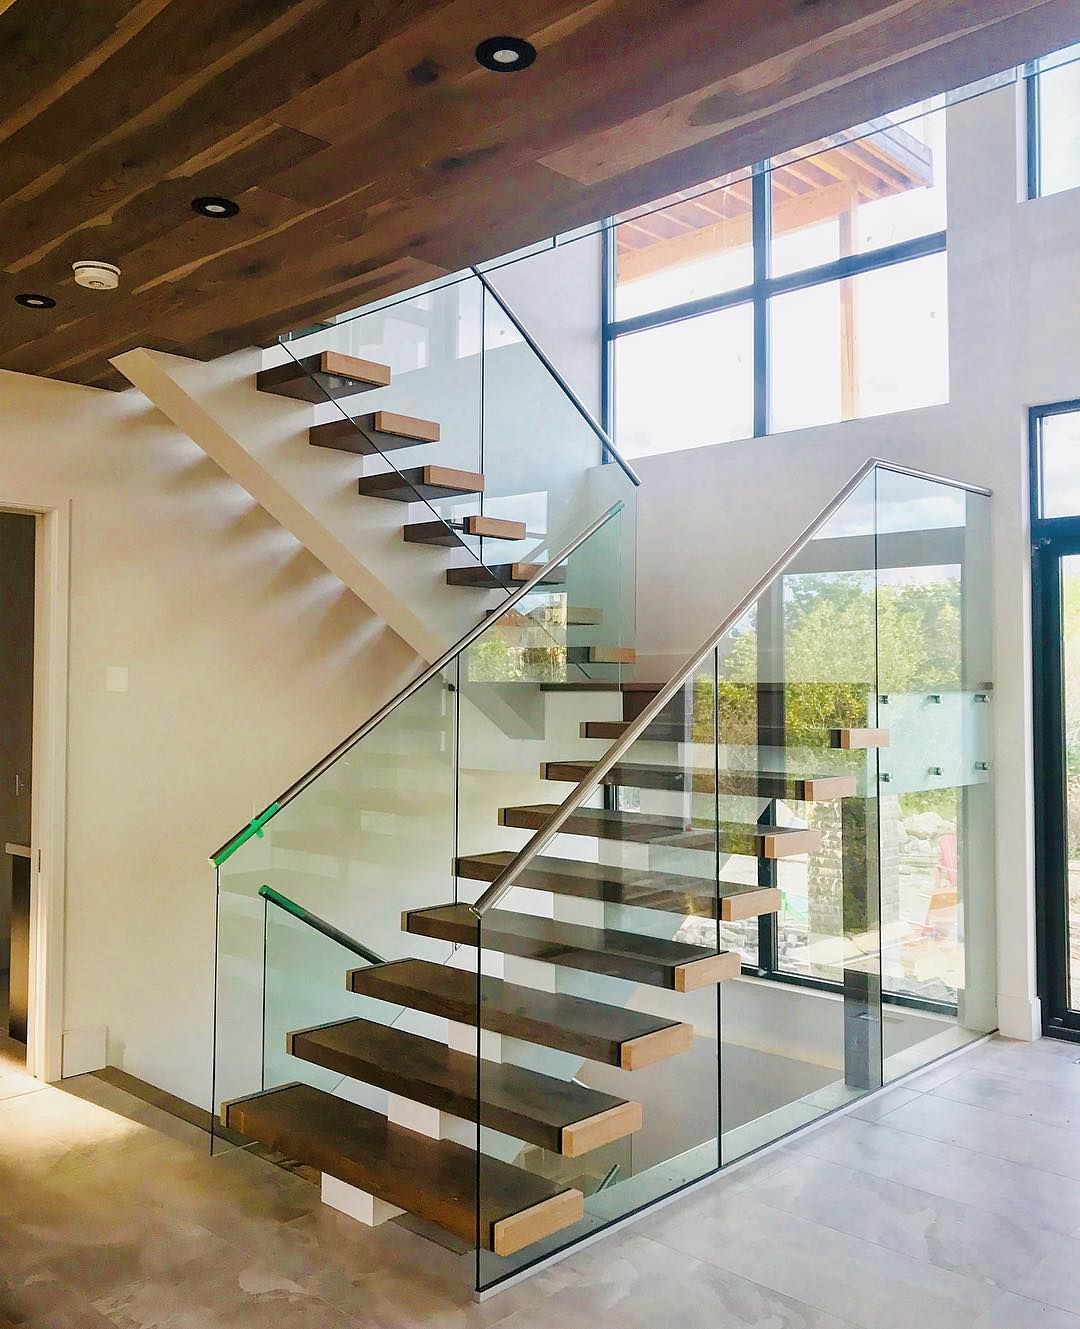 77 Elegant Stock Of Single Stringer Steel Stairs Glass Stairs